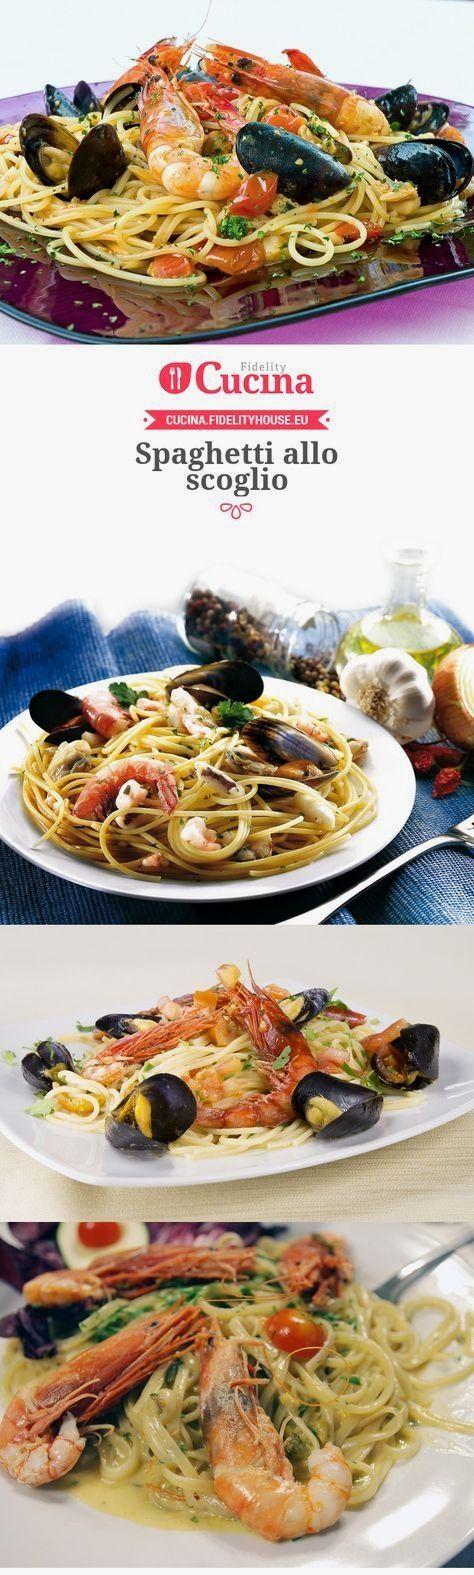 Photo of Best Food Region In Italy